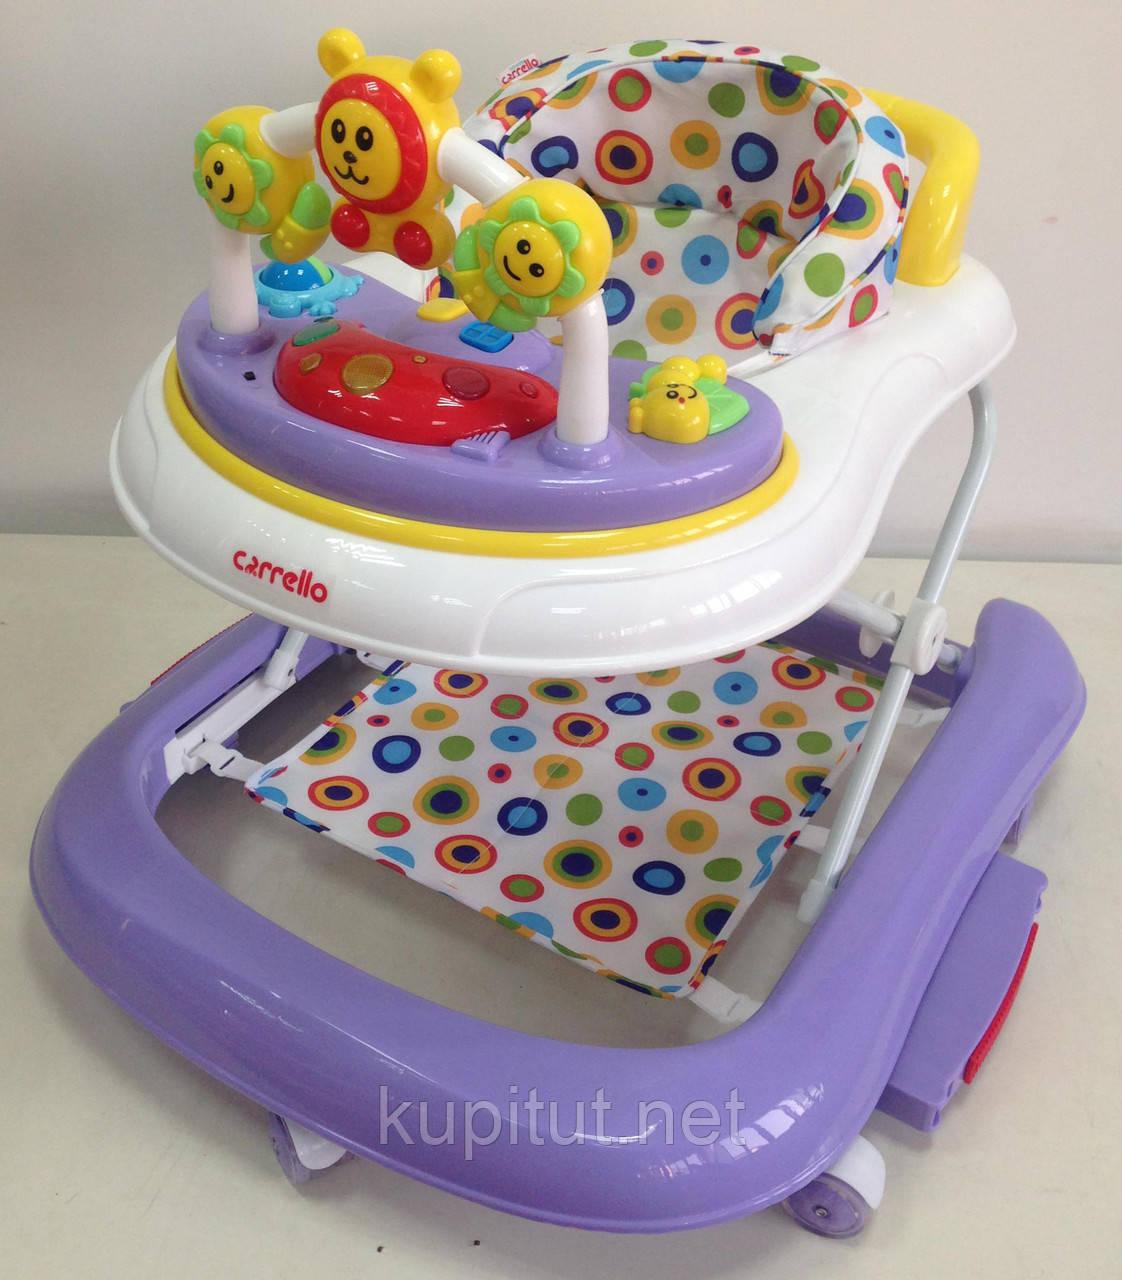 Детские ходунки Carrello Карело crl-9602  3 в 1: ходунки, качалка, каталка, с подвесками, purple, фиолетовый